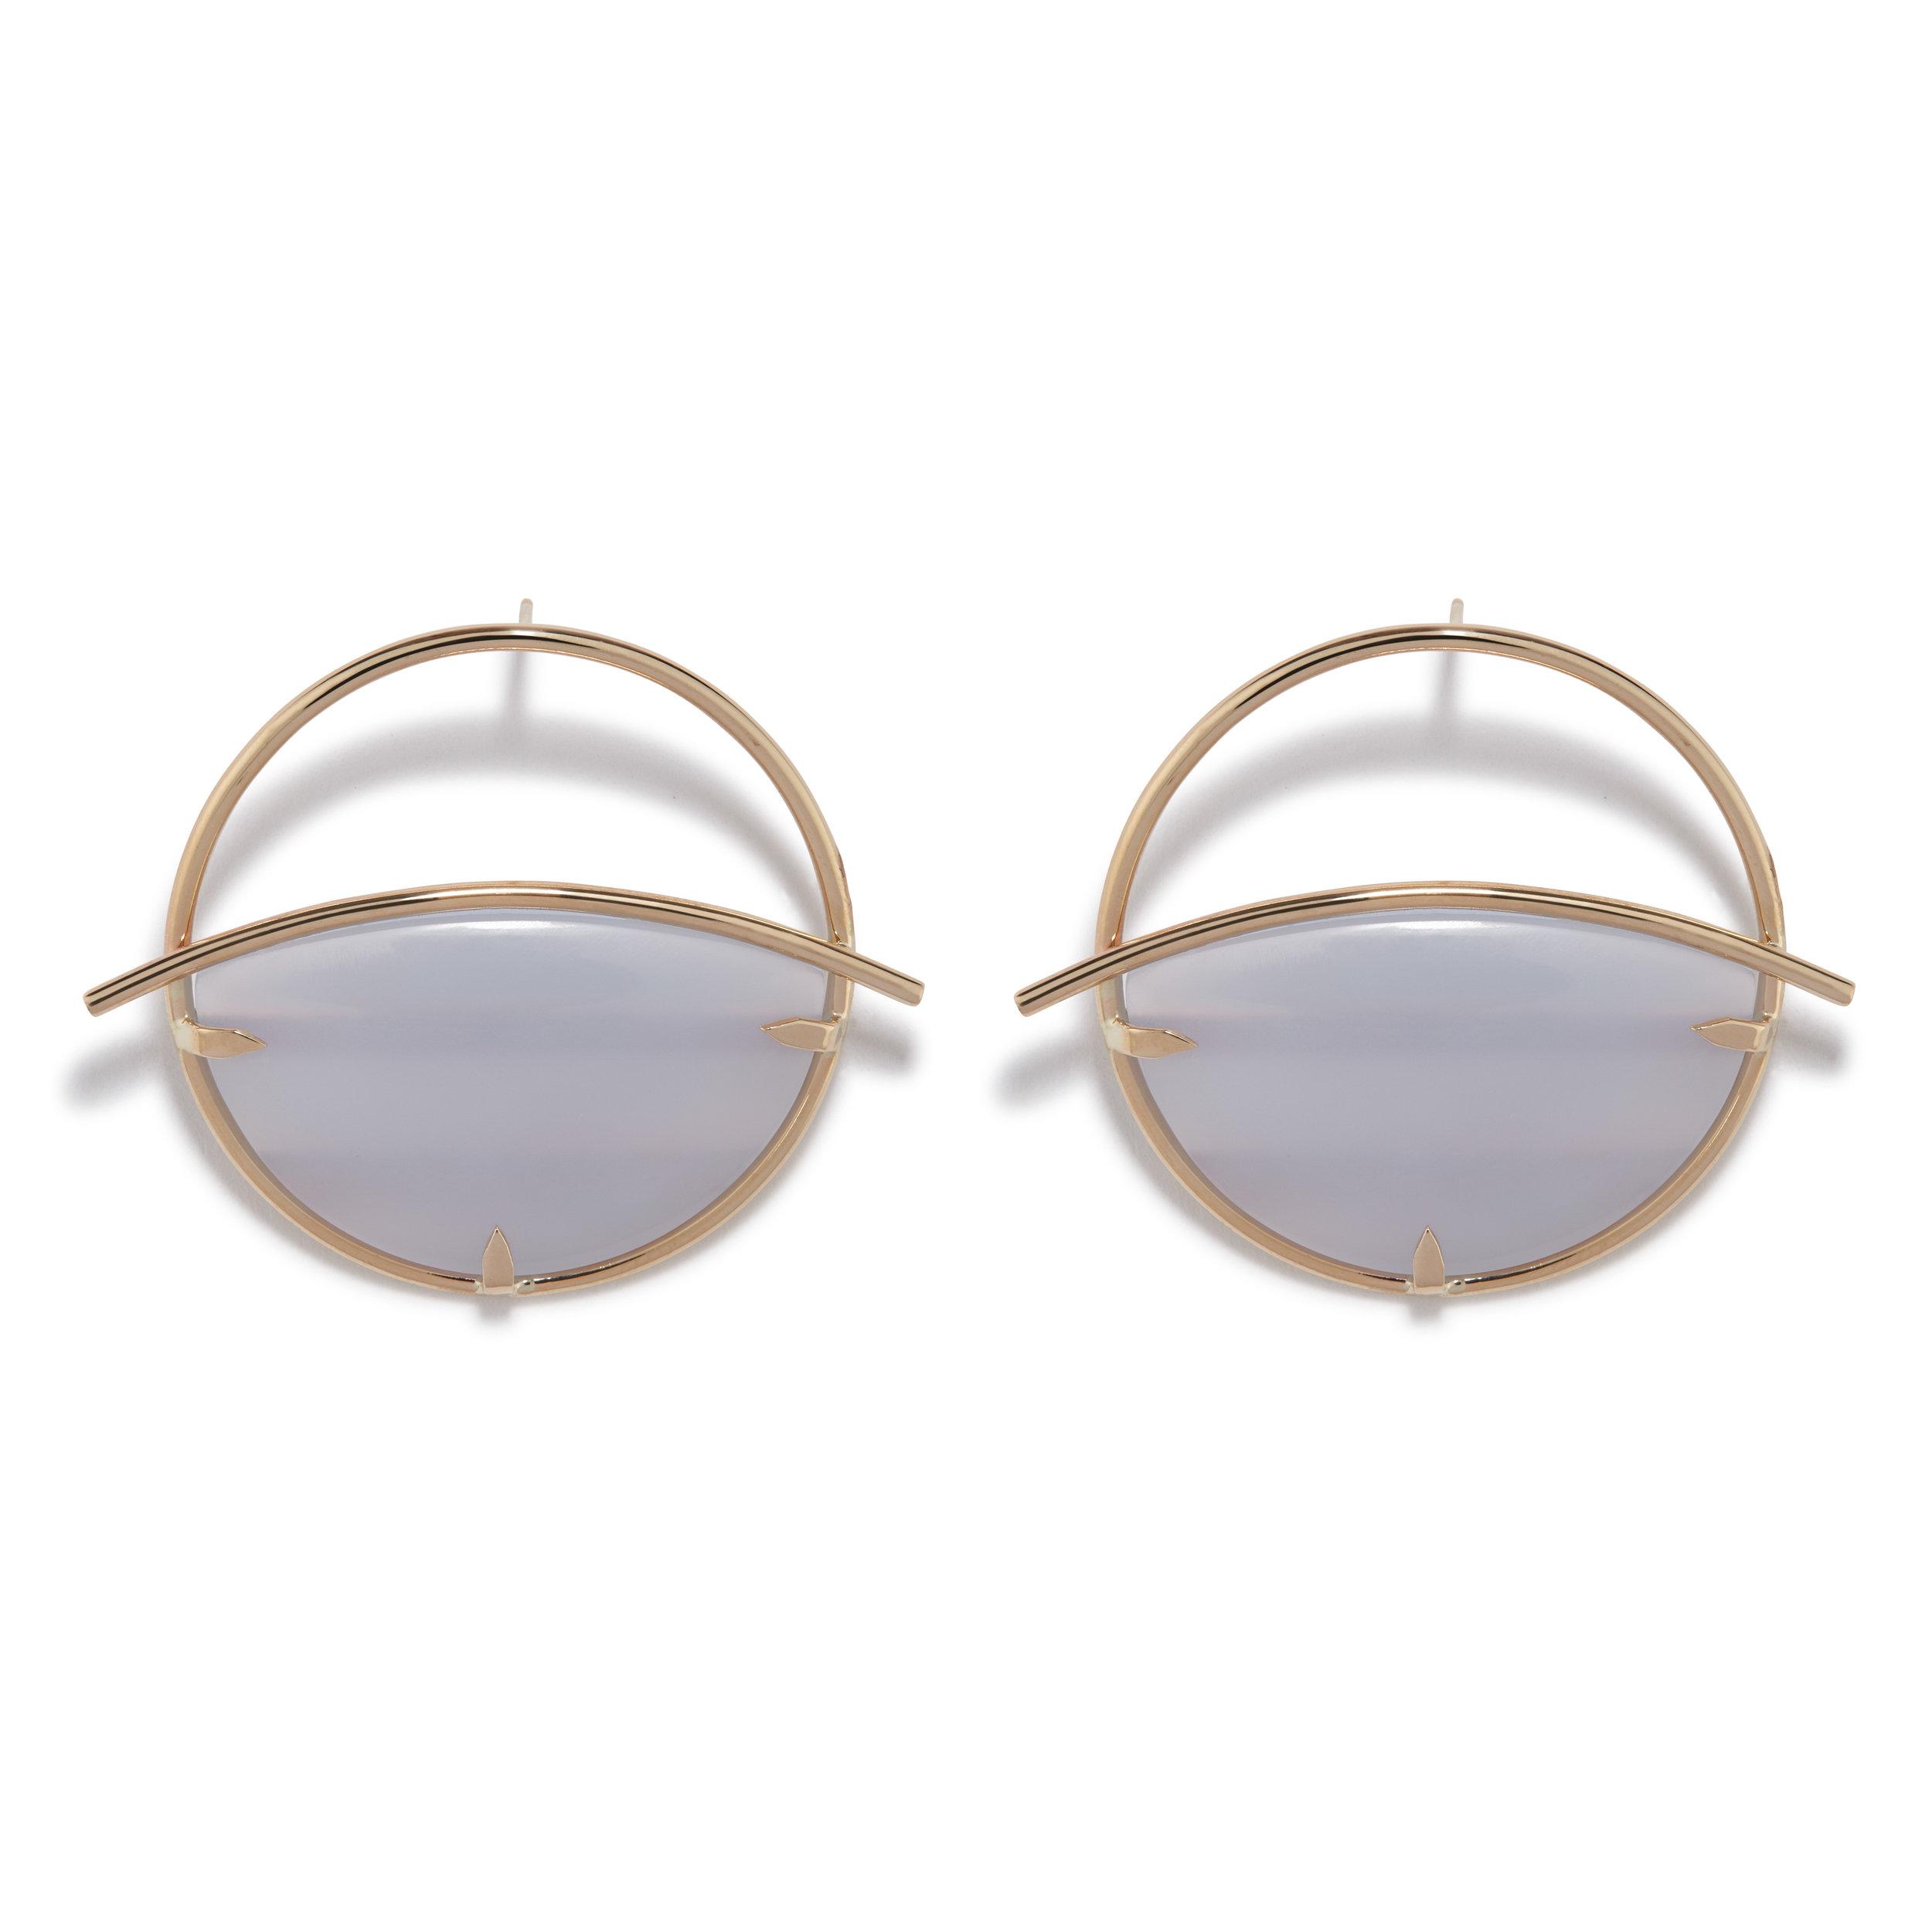 Circe Earrings - Blue Chalcedony